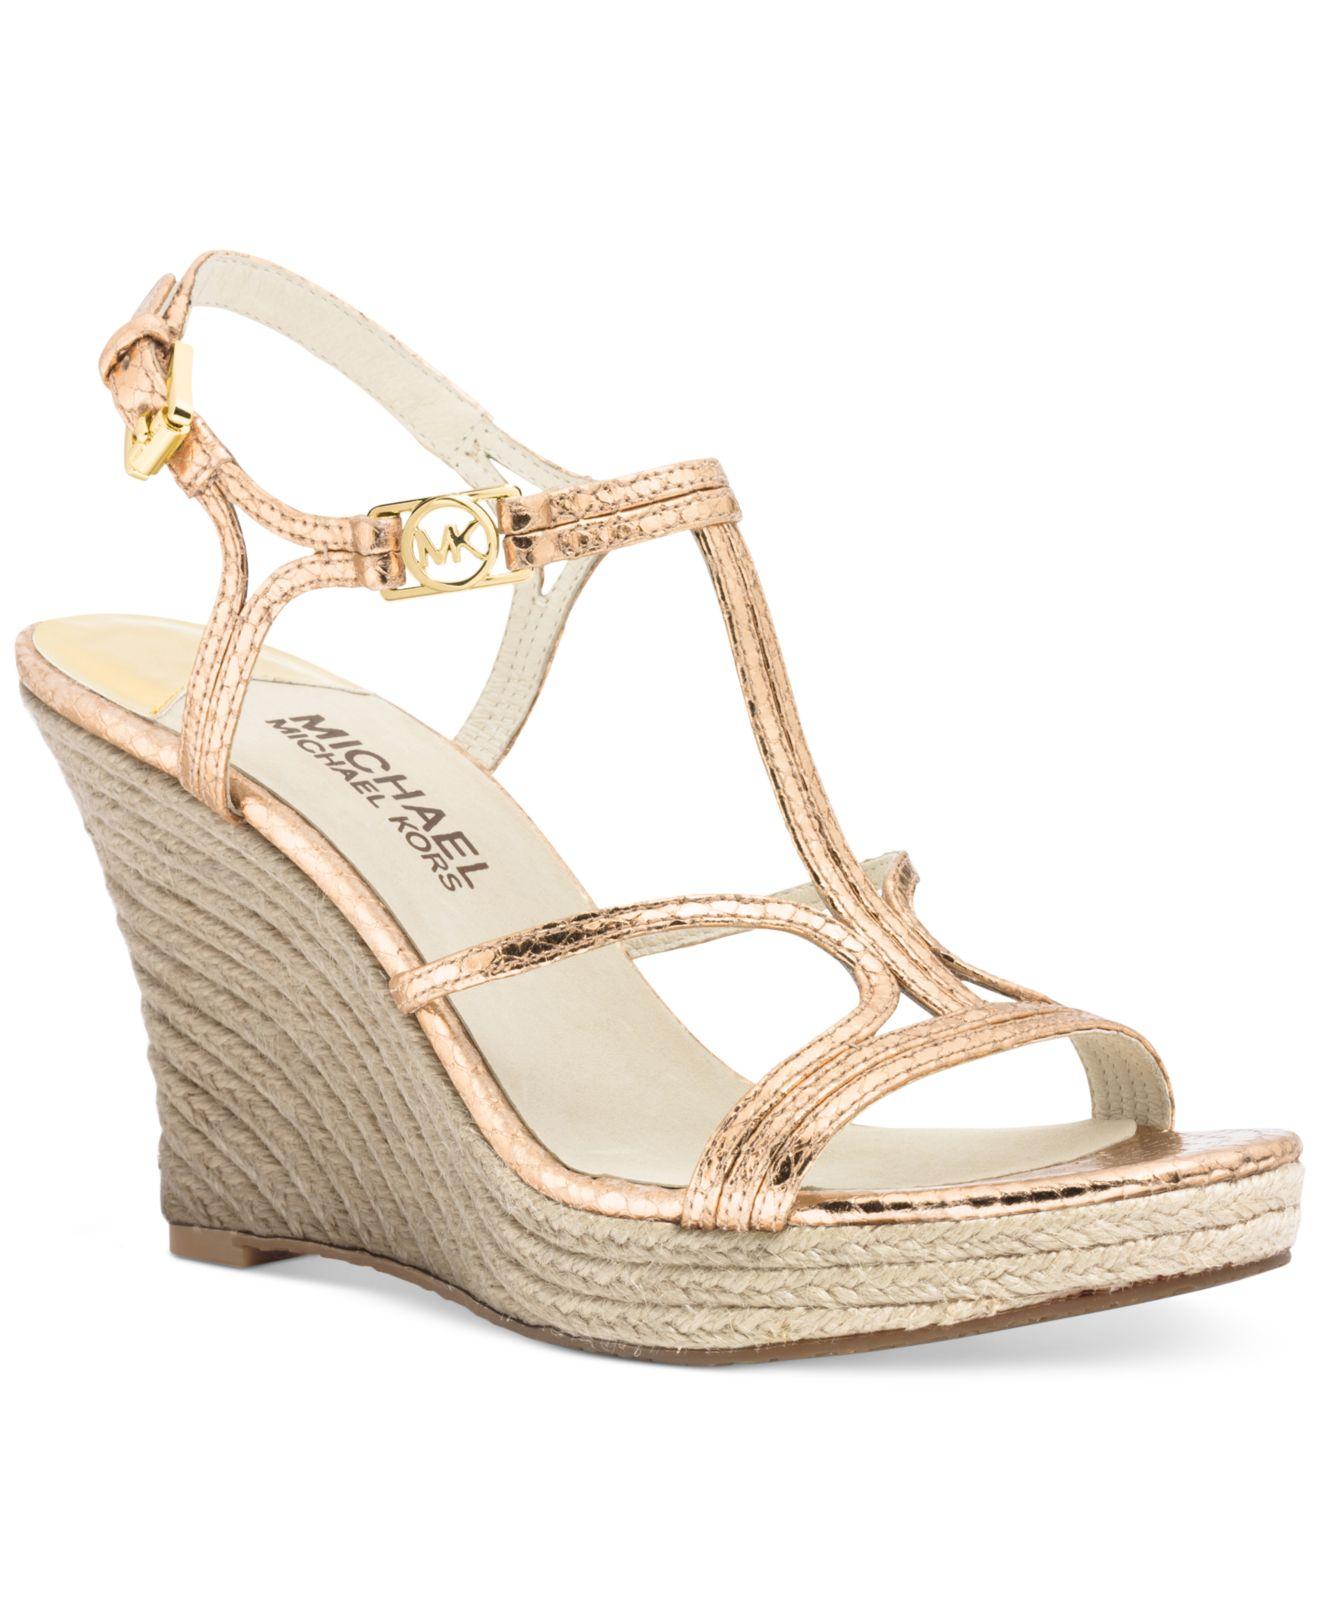 Castaner Shoes Sizing